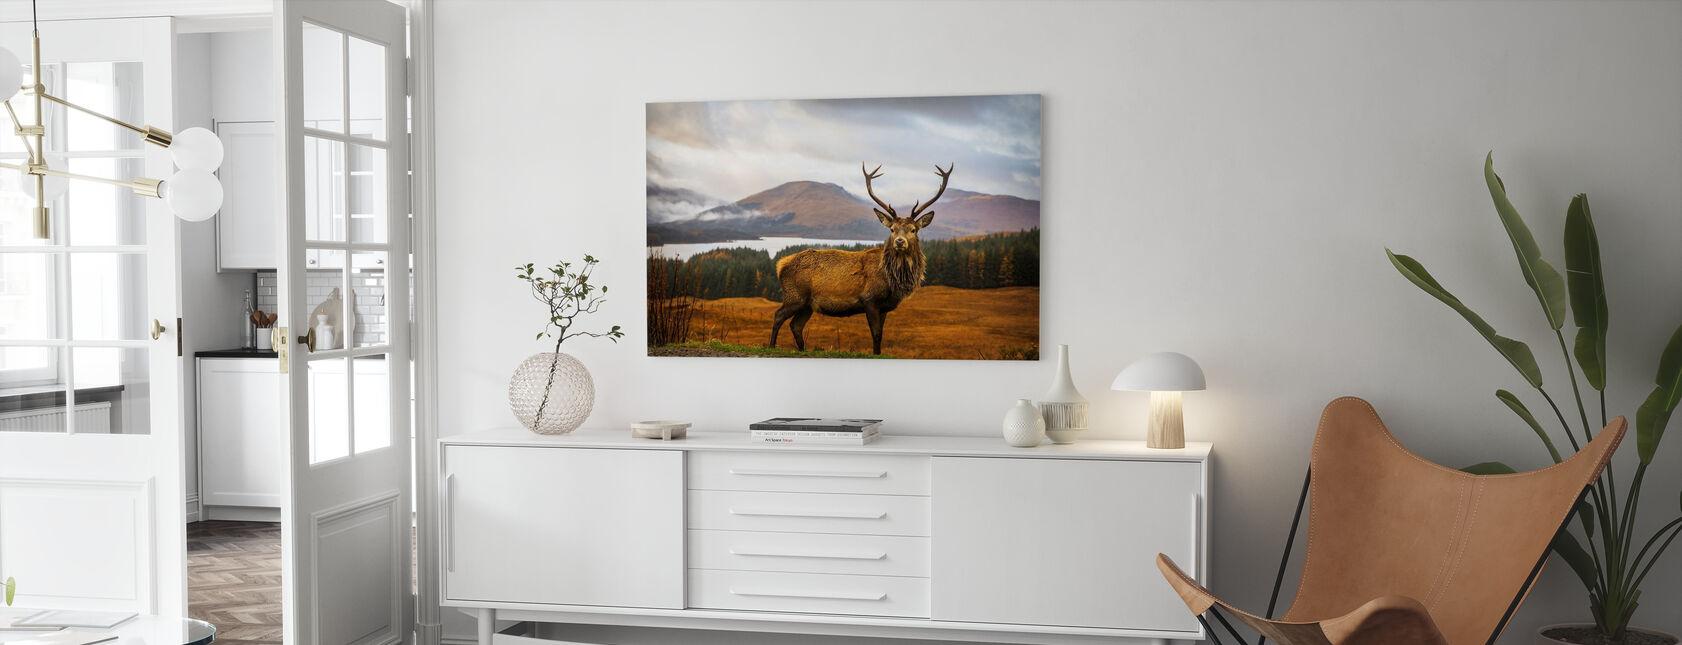 Skotsk hjort - Lerretsbilde - Stue